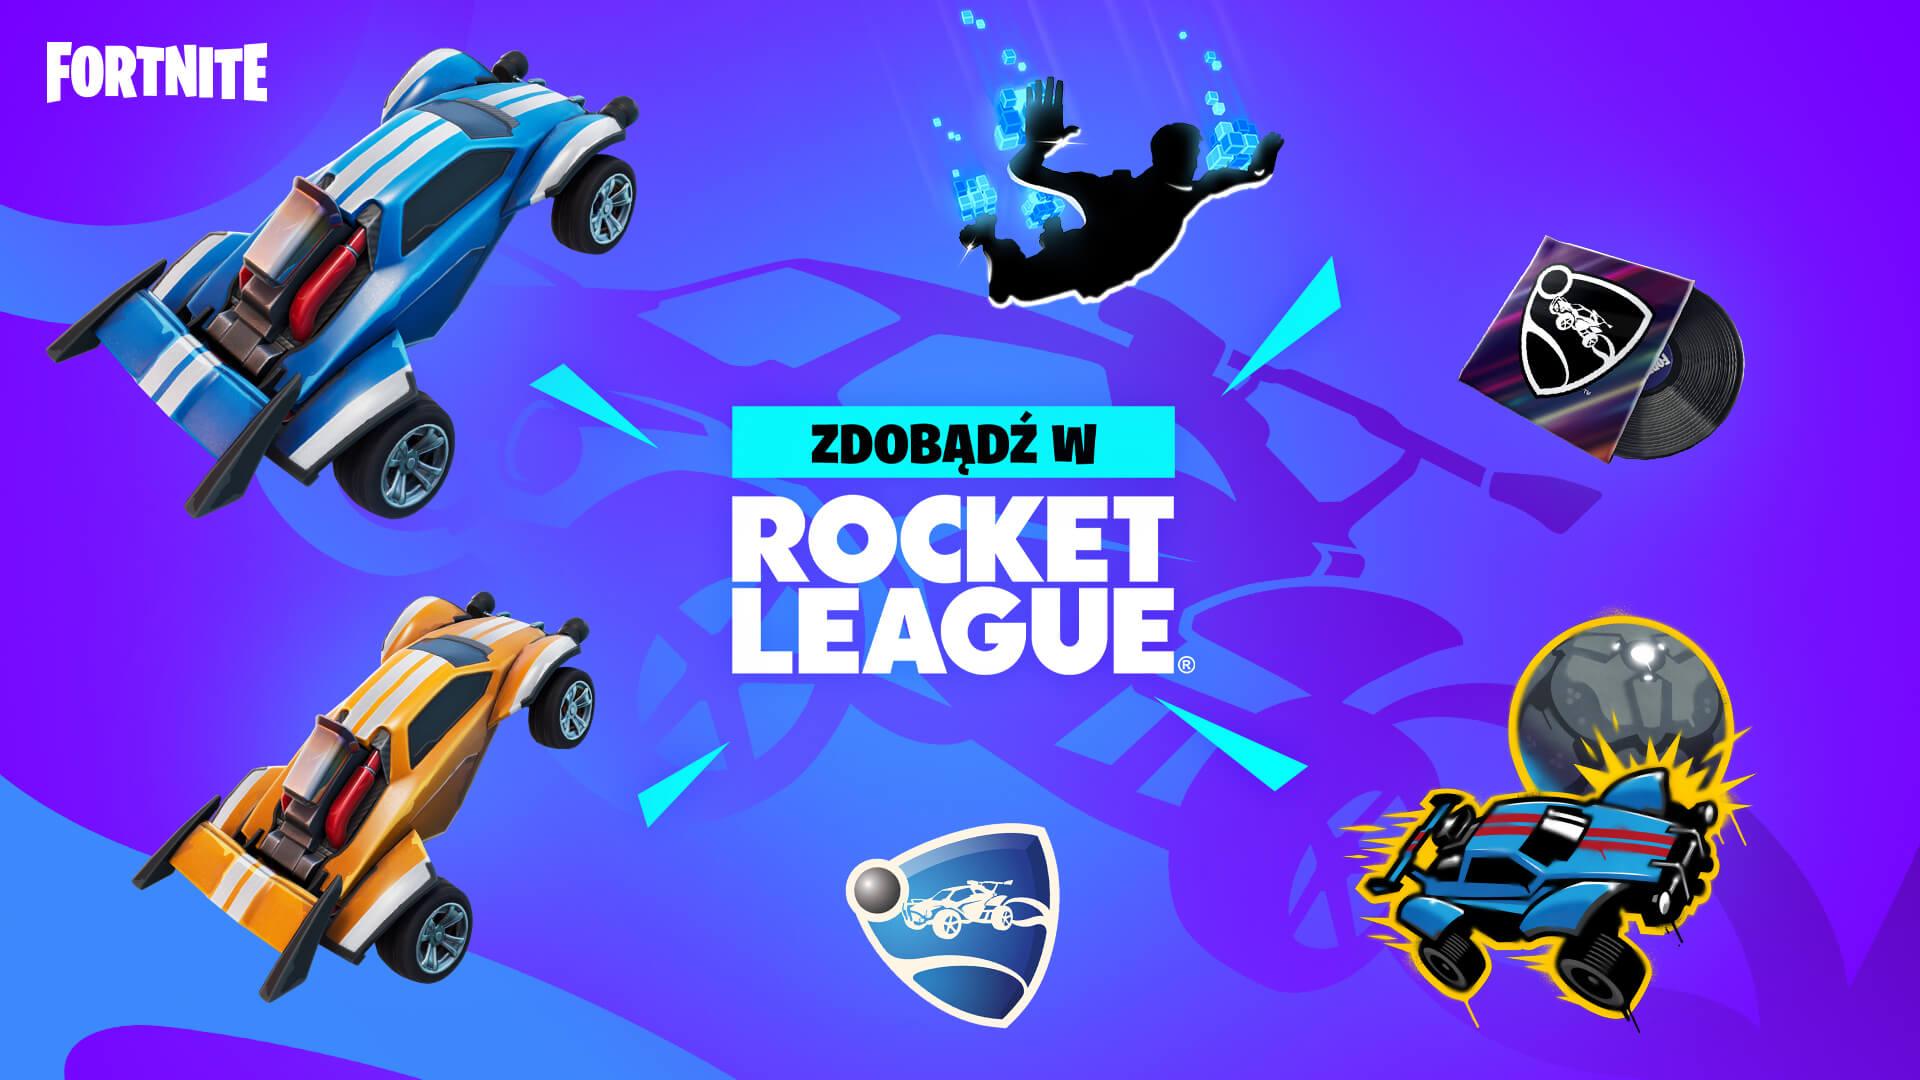 PL Rocket League Fortnite Challenges And Rewards